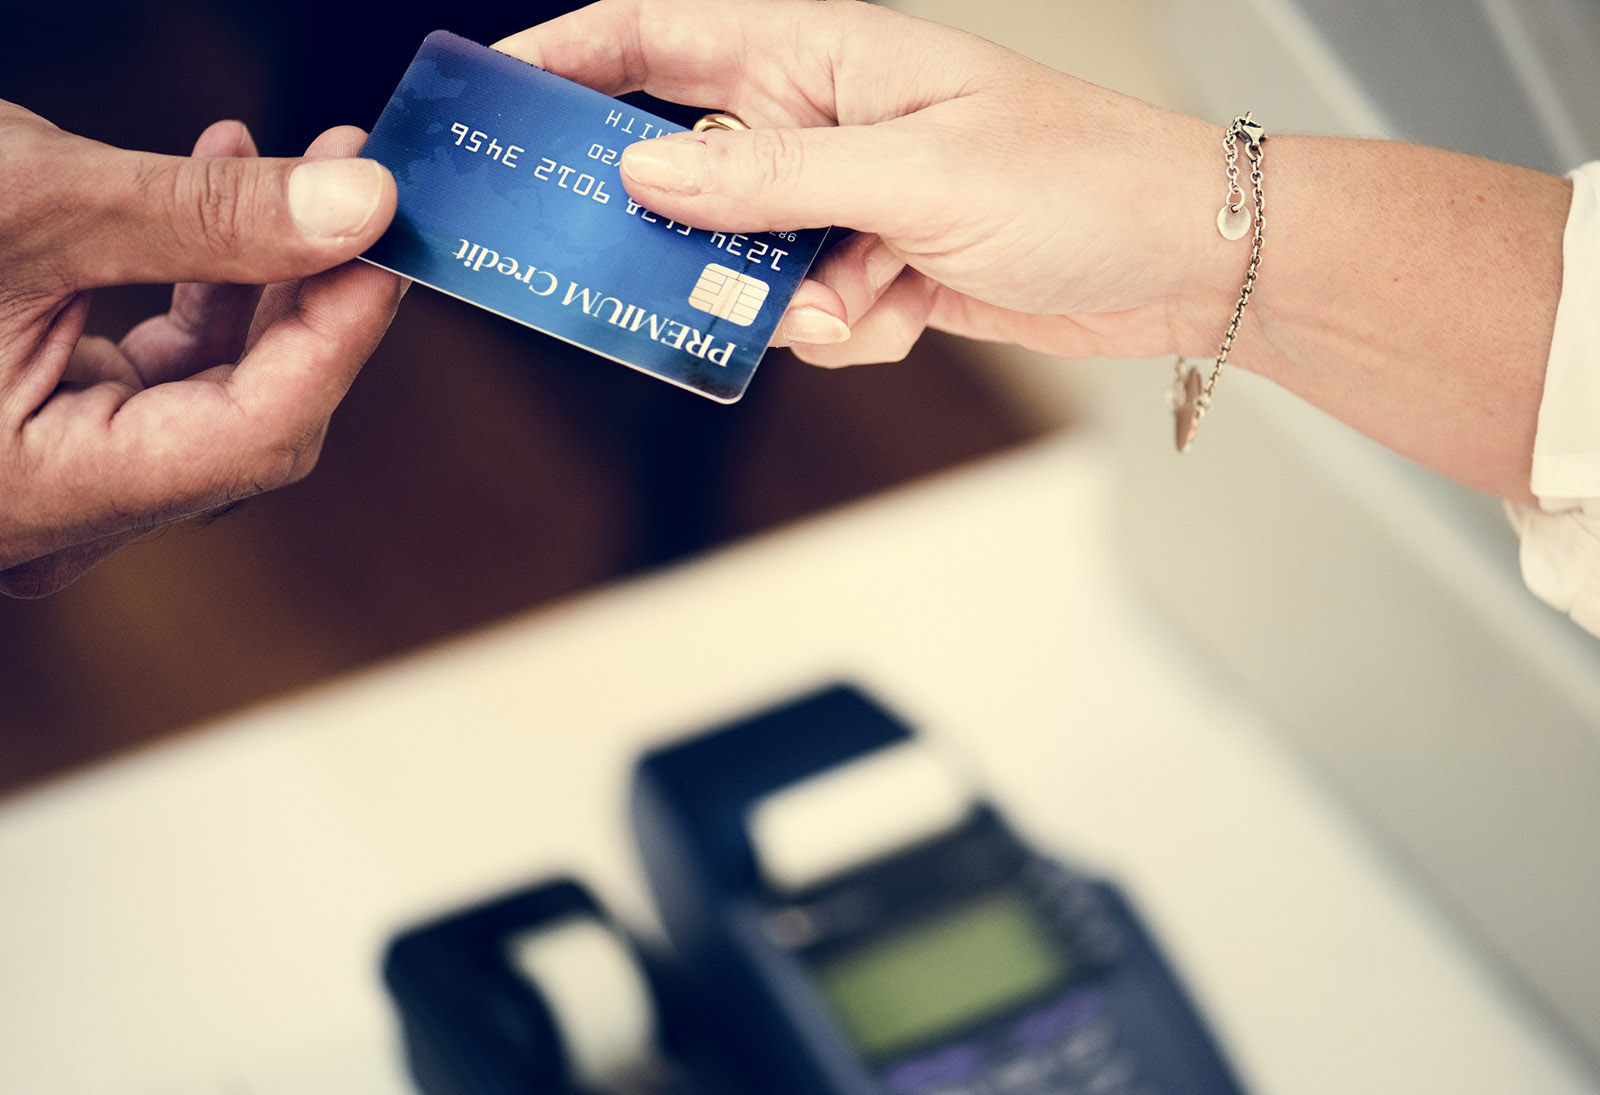 navidor-merchant-services-solutions-paiements-2-2